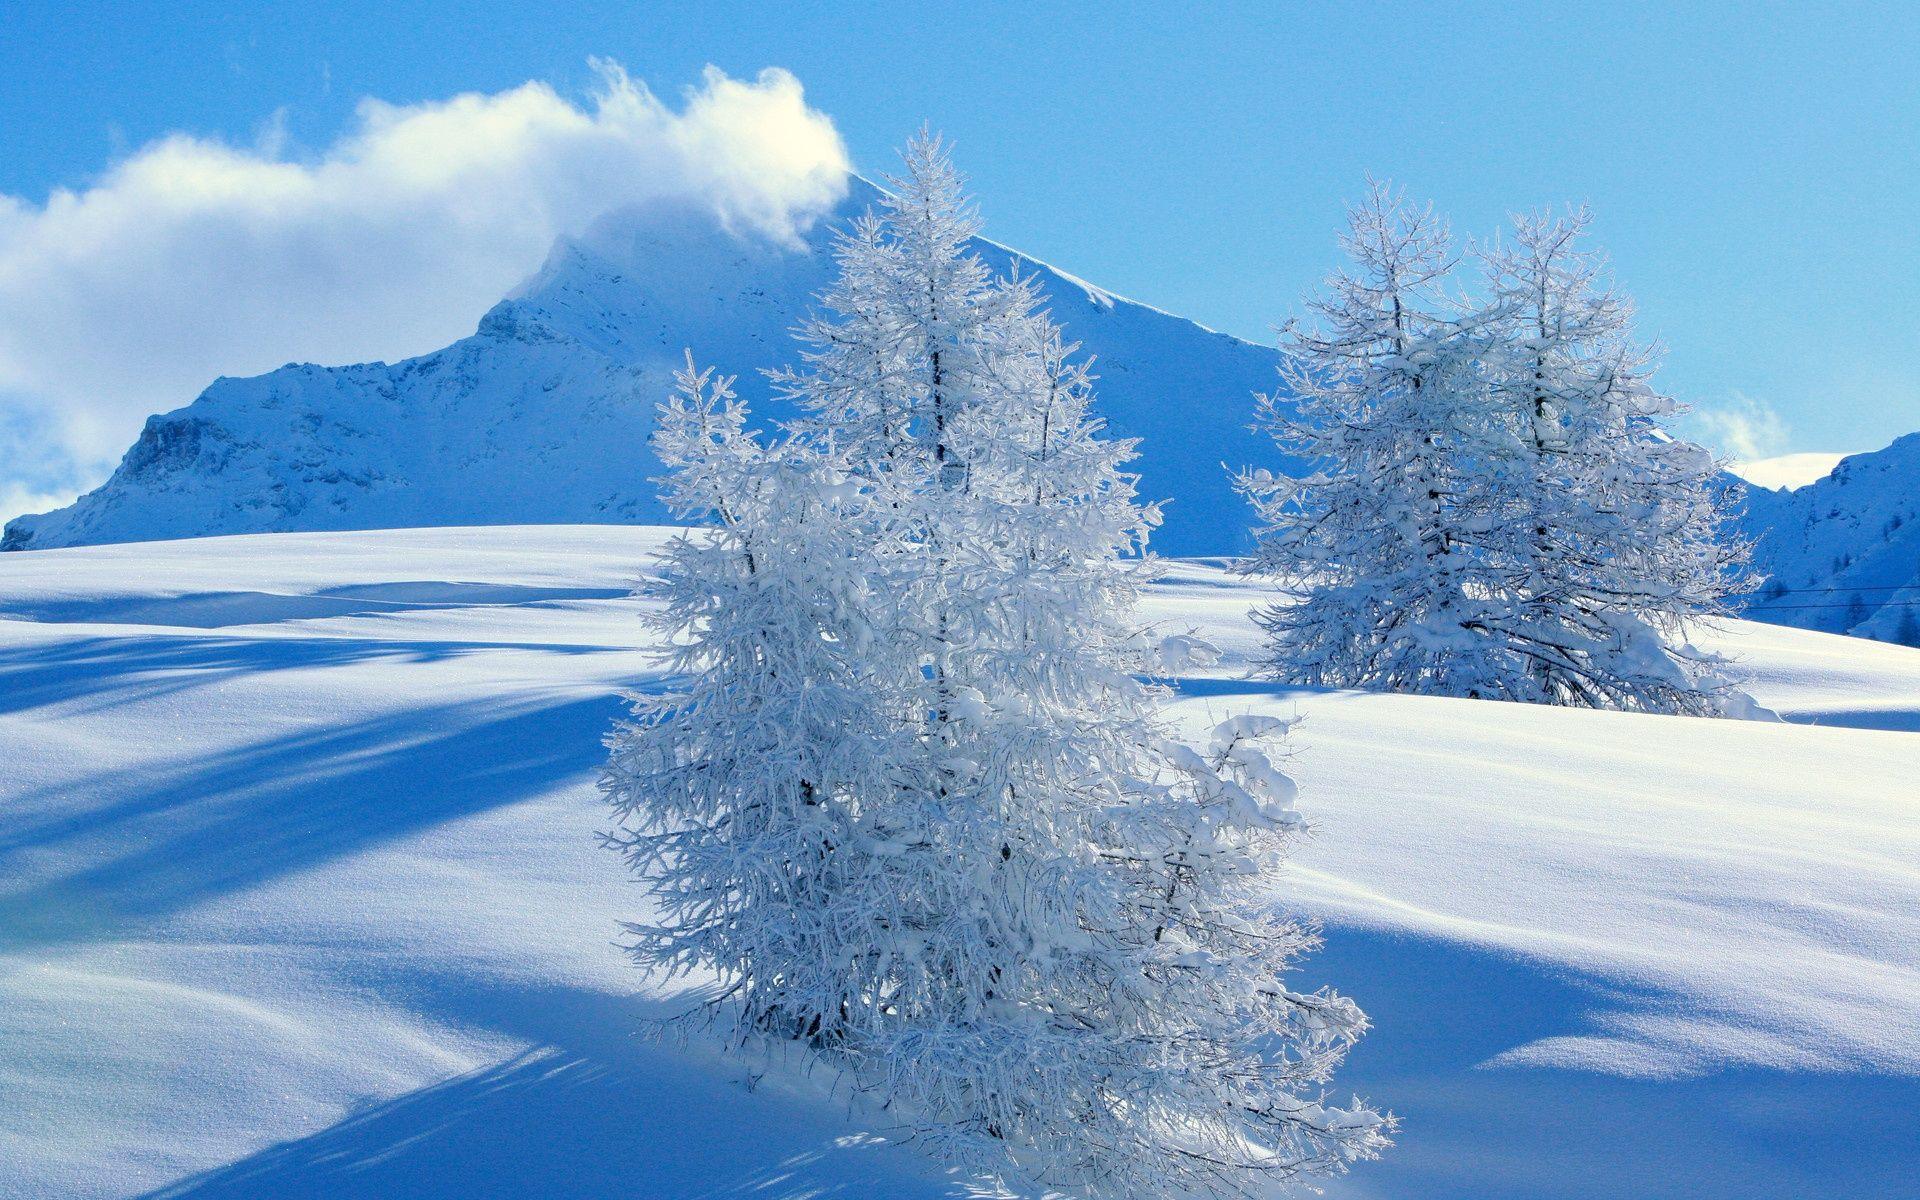 Landscape Beautiful Wallpaper Jpg 1 920 1 200 Pixels Snowfall Wallpaper Landscape Wallpaper Winter Landscape Photography